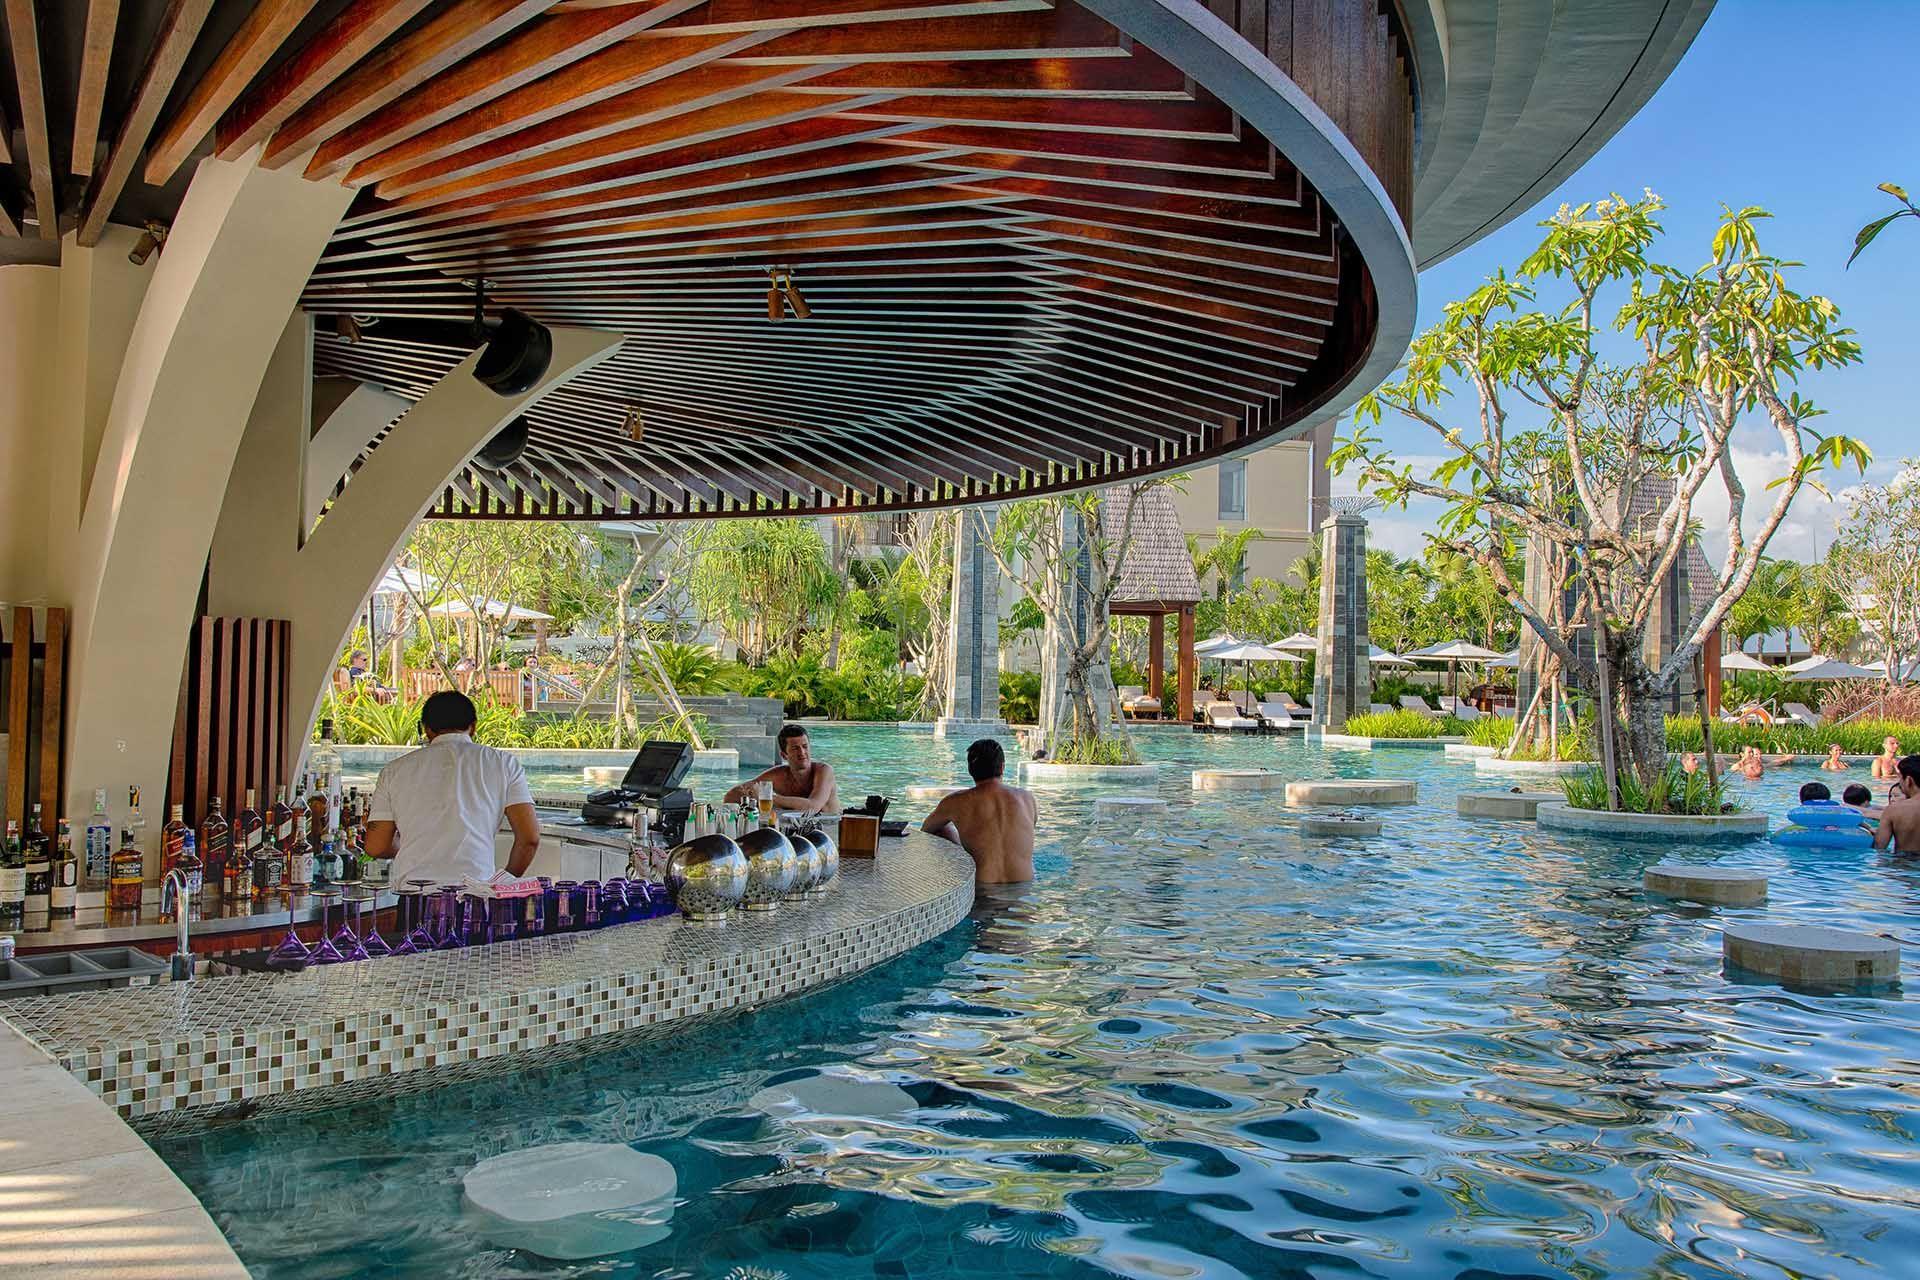 sofitel nusa dua pool bar bali villas hotels pinterest pool bar bali nusa dua and beach. Black Bedroom Furniture Sets. Home Design Ideas